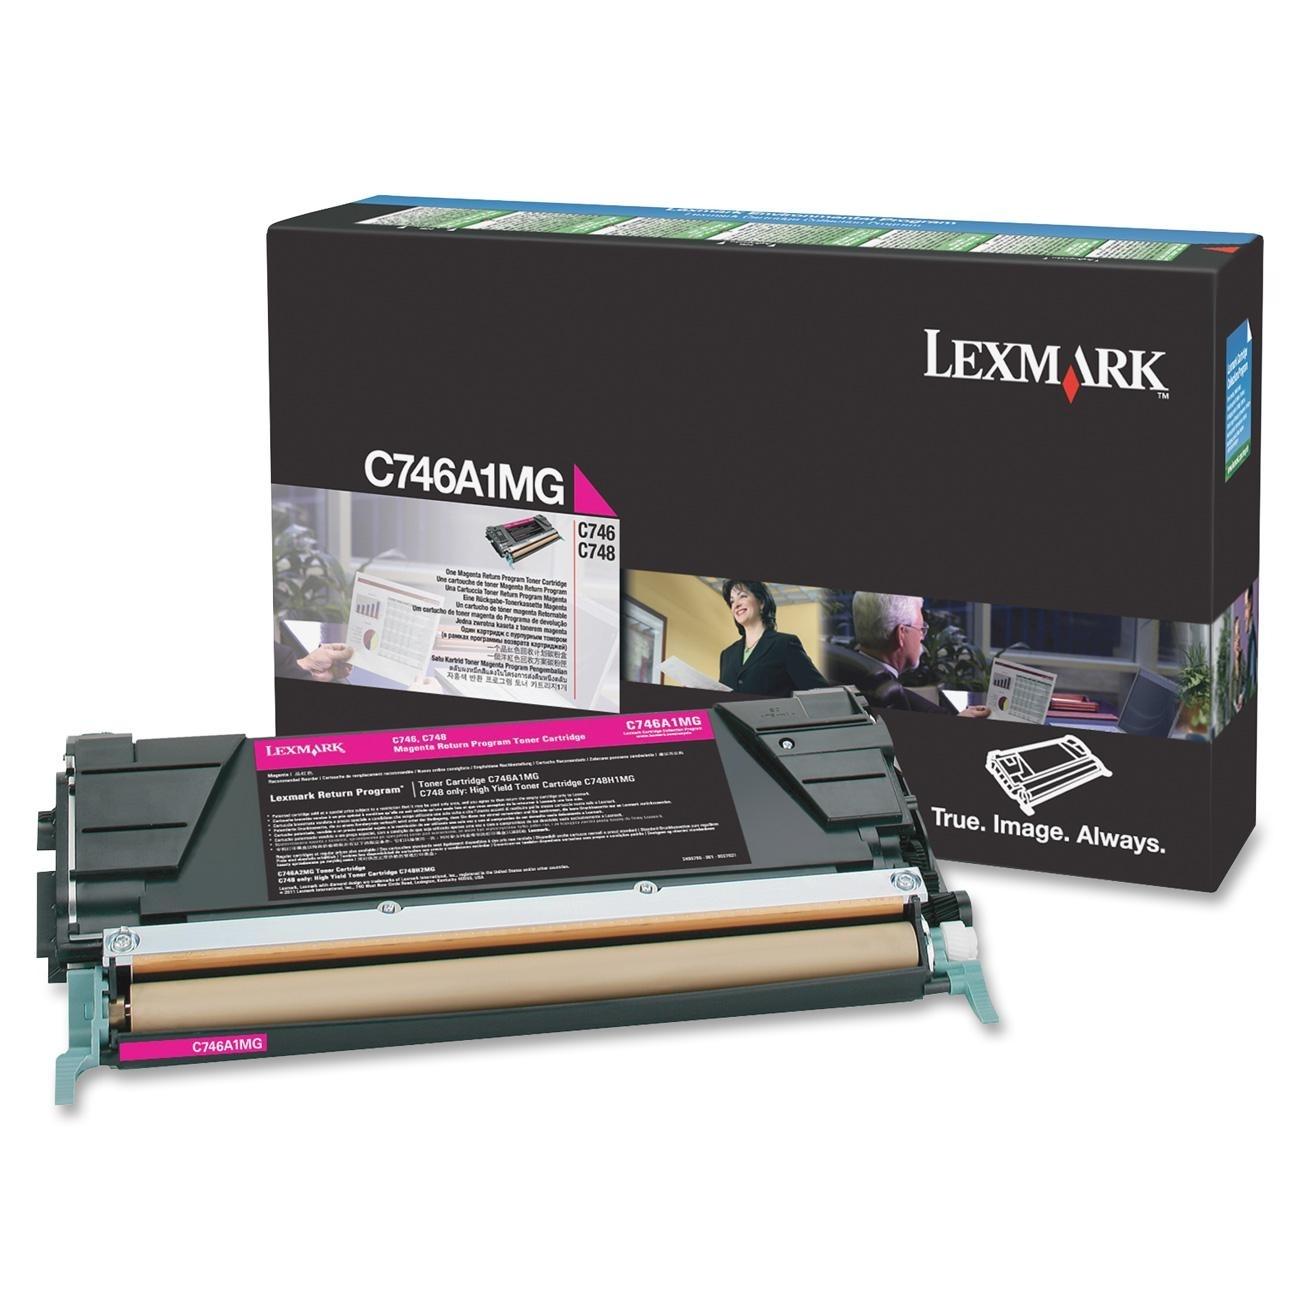 Lexmark C746A1MG Laser cartridge 7000Seiten Magenta Lasertoner / Patrone